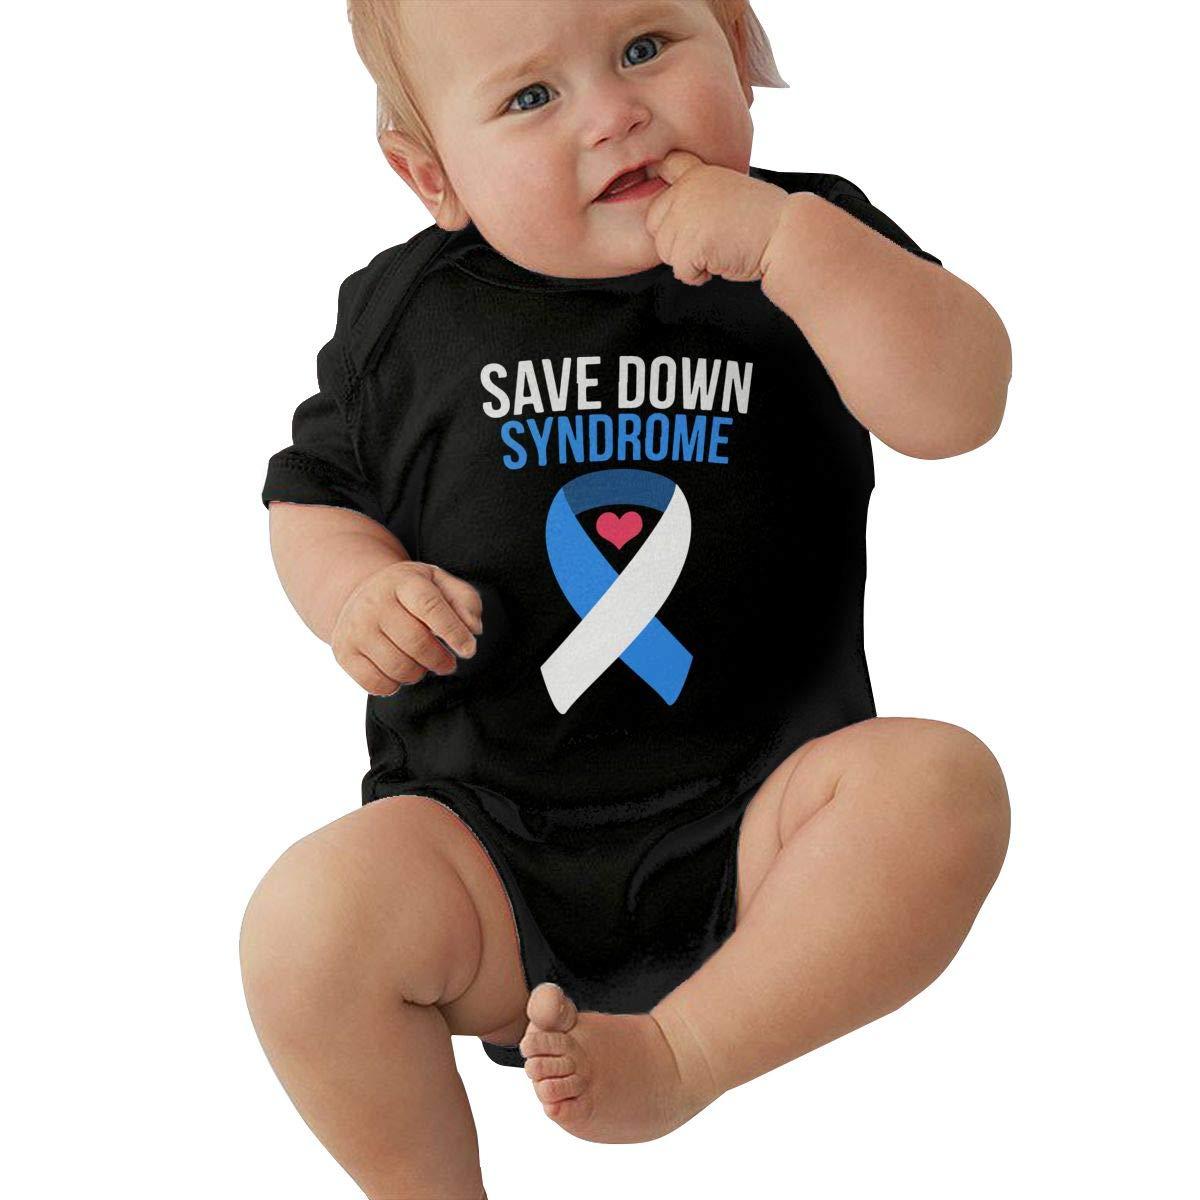 Save Down Syndrome Infant Baby Original Cotton Short-Sleeve Bodysuit